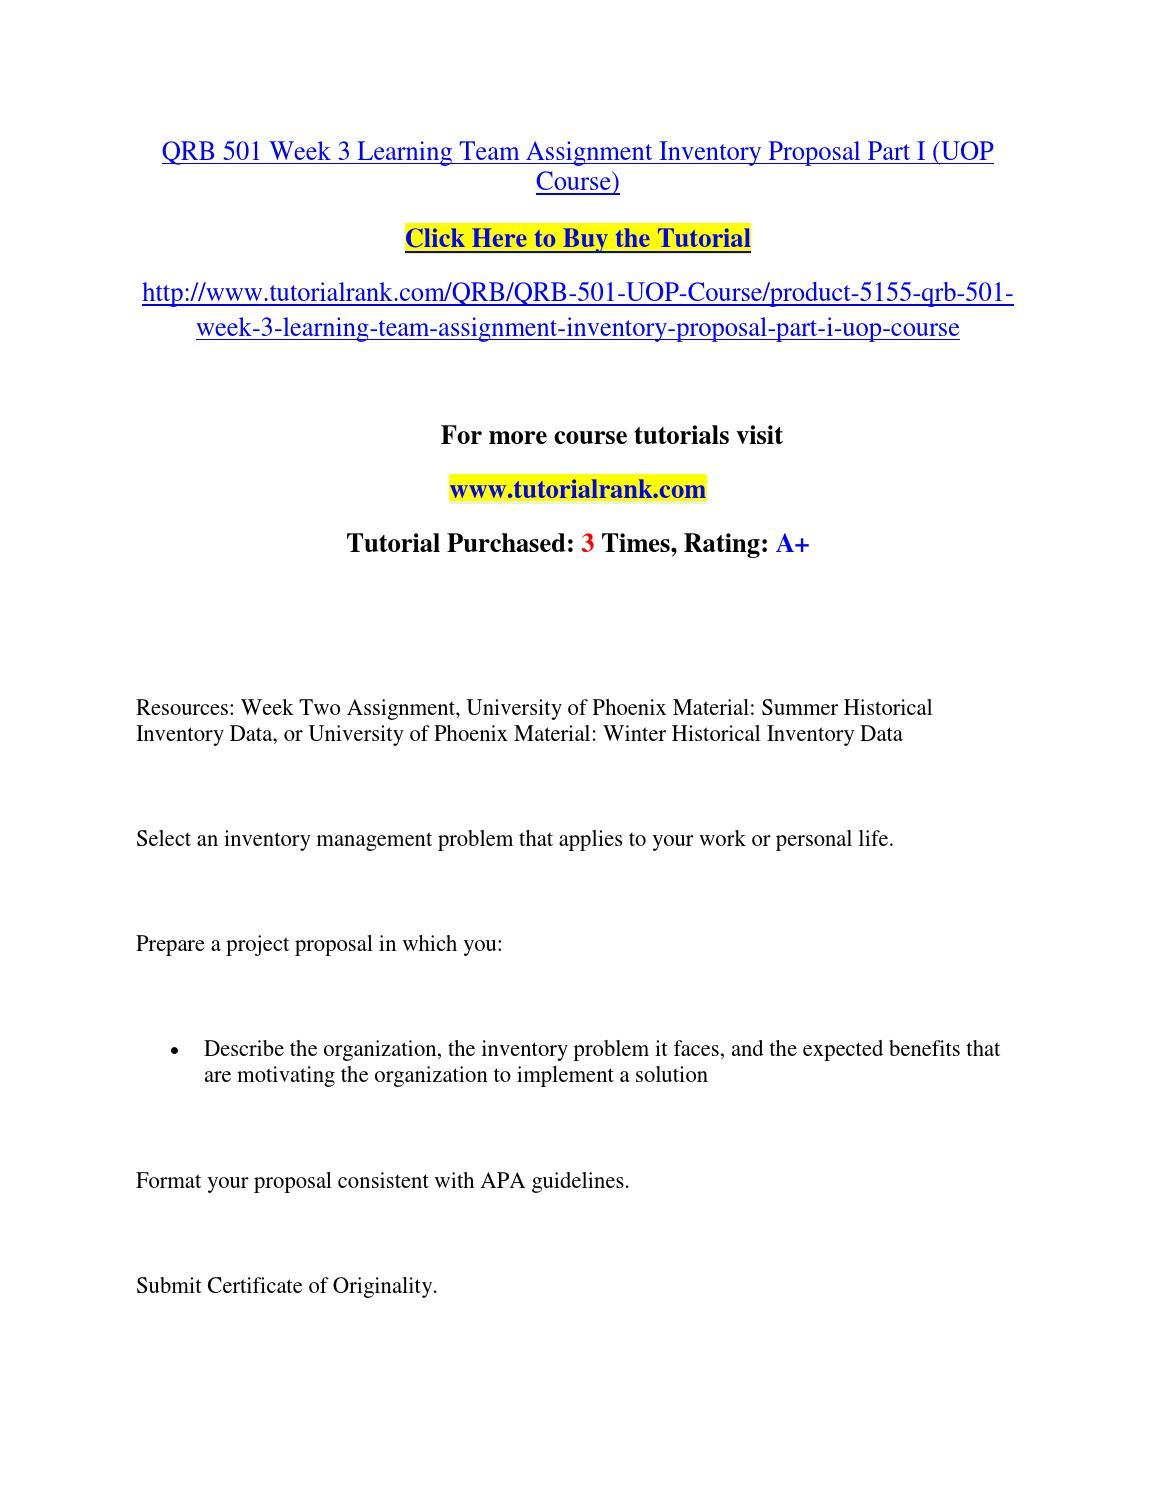 IT215 Week 6 Inventory Program Part 3